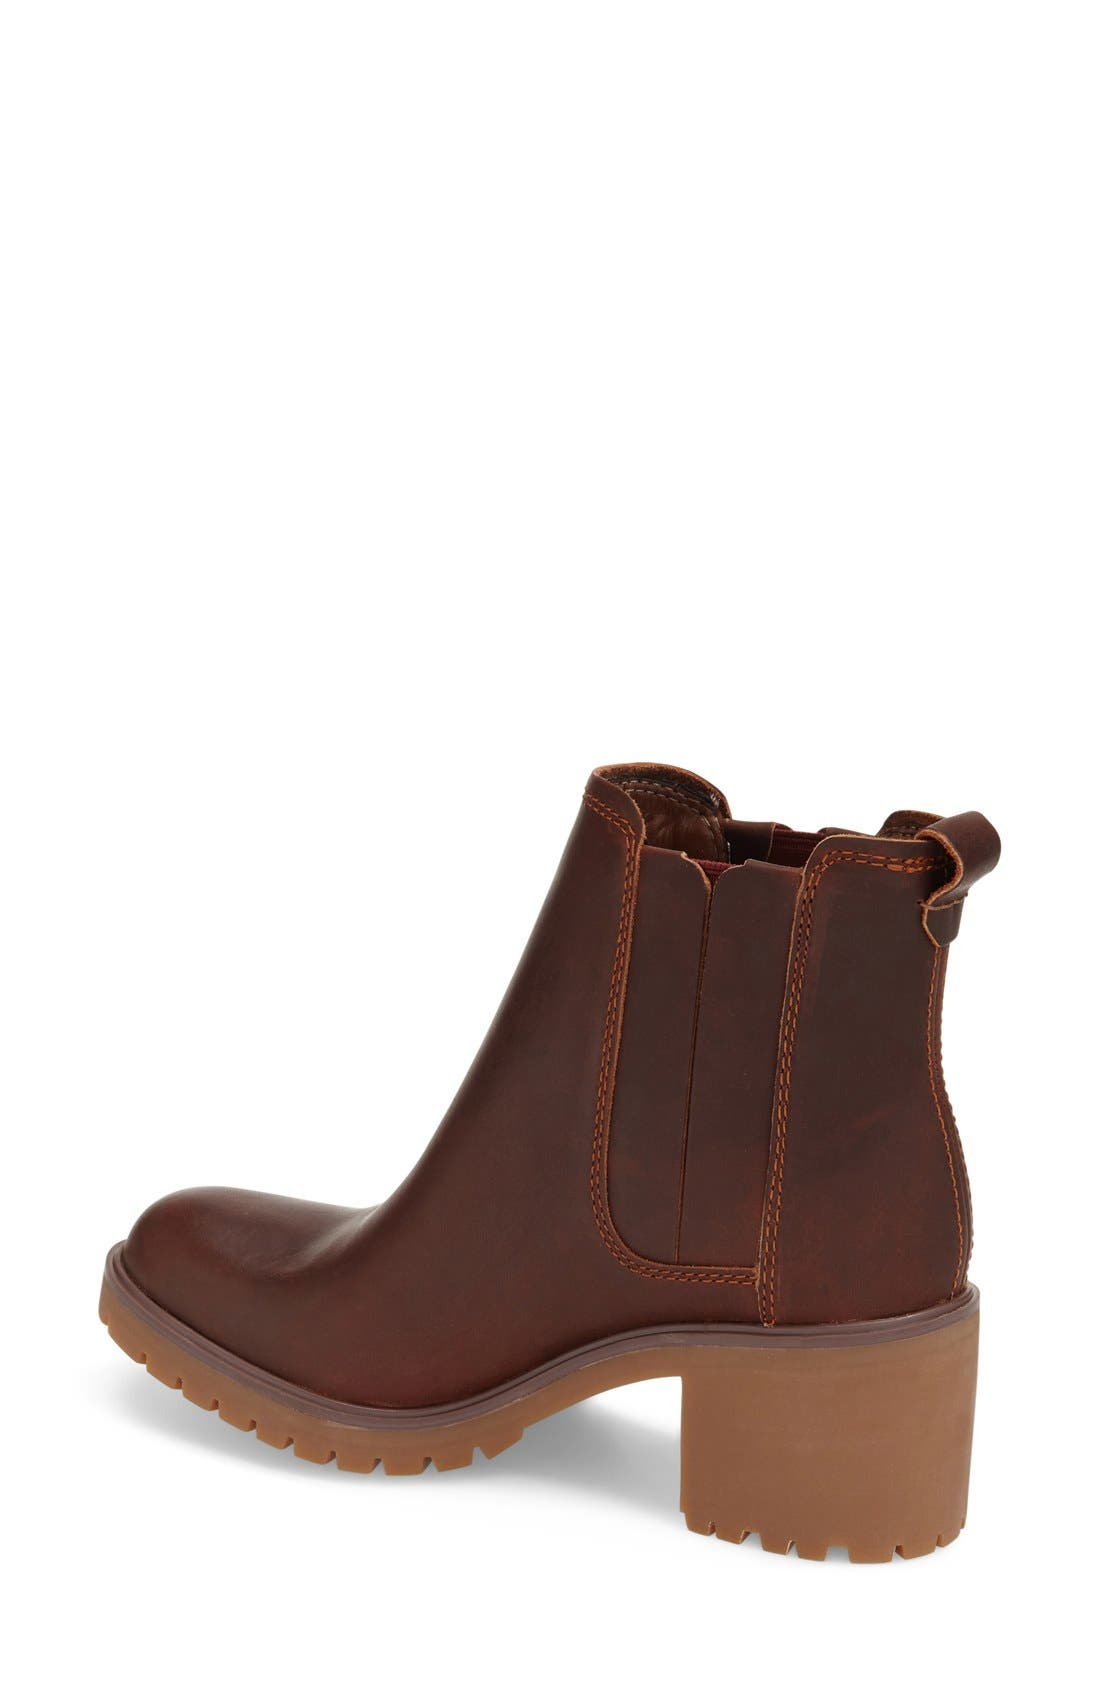 Alternate Image 2  - Timberland 'Avery' Chelsea Boot (Women)